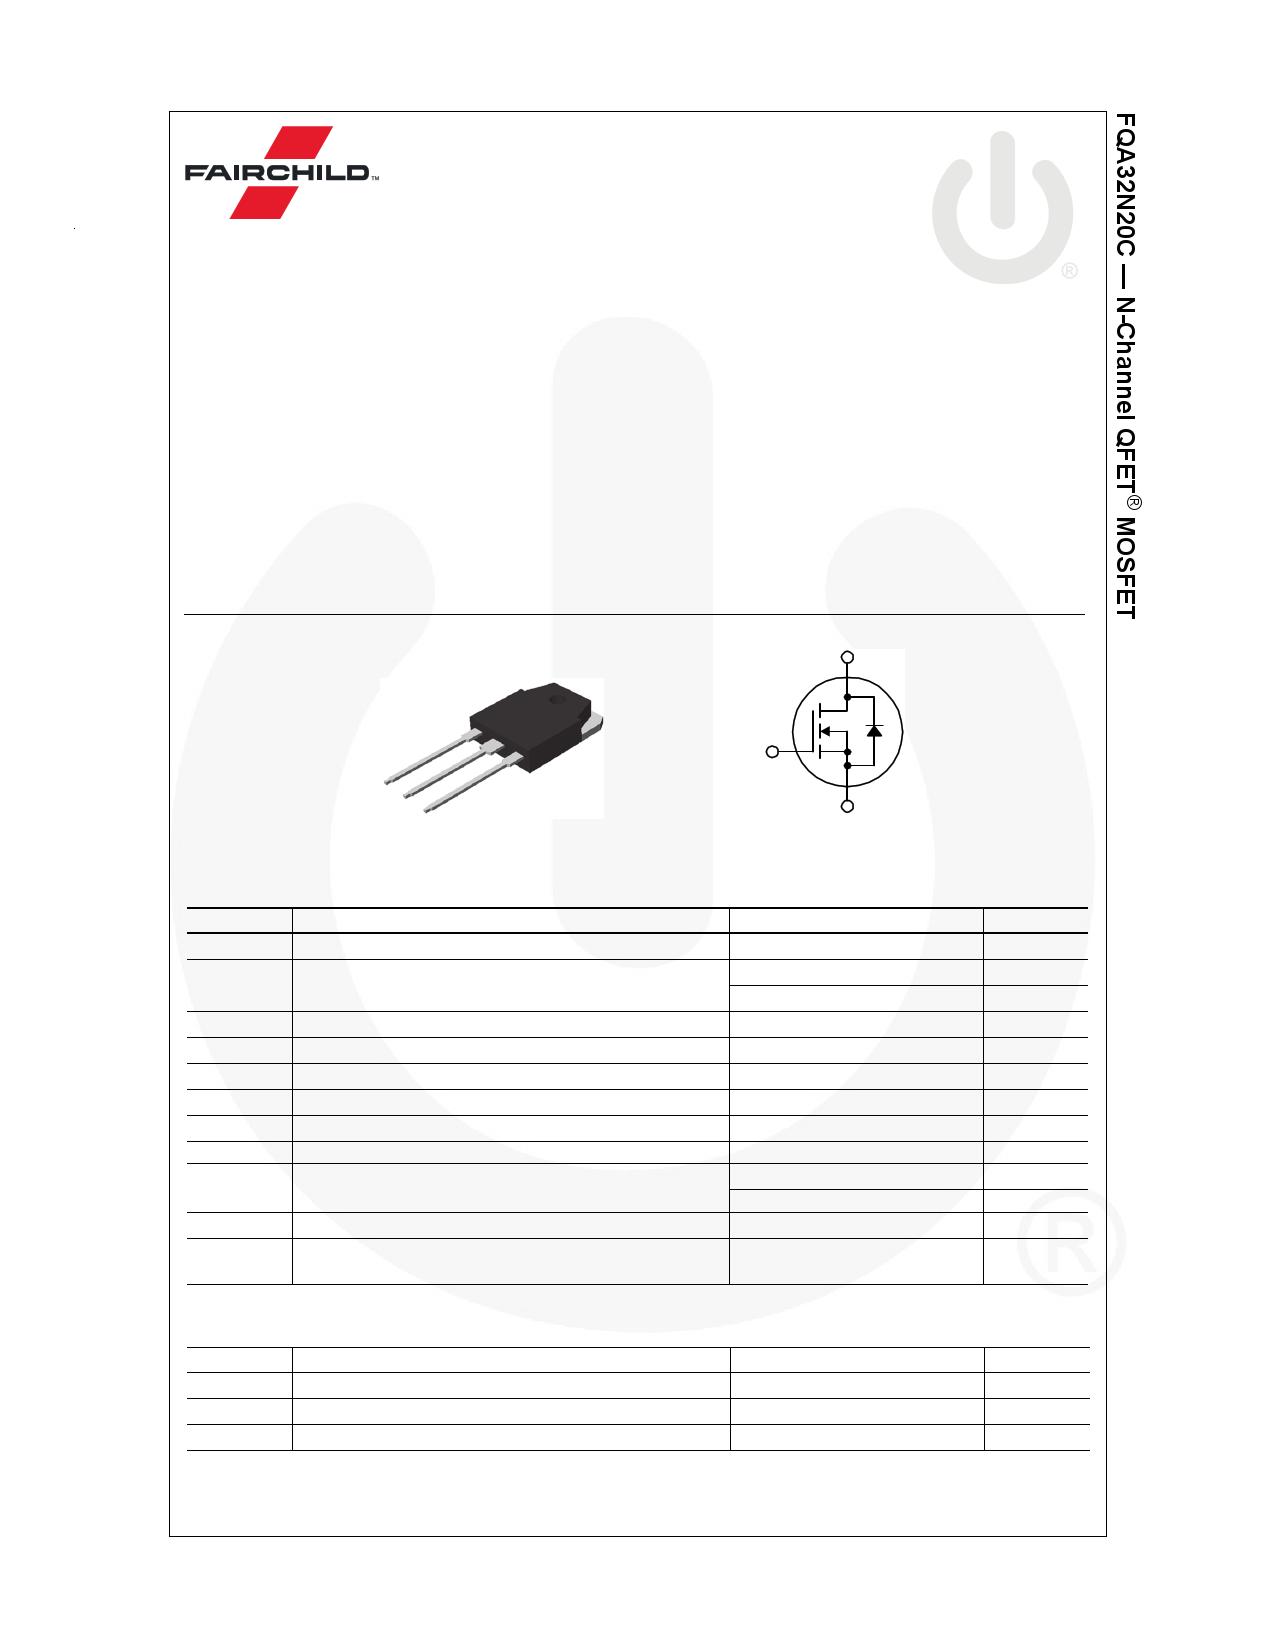 FQA32N20C datasheet